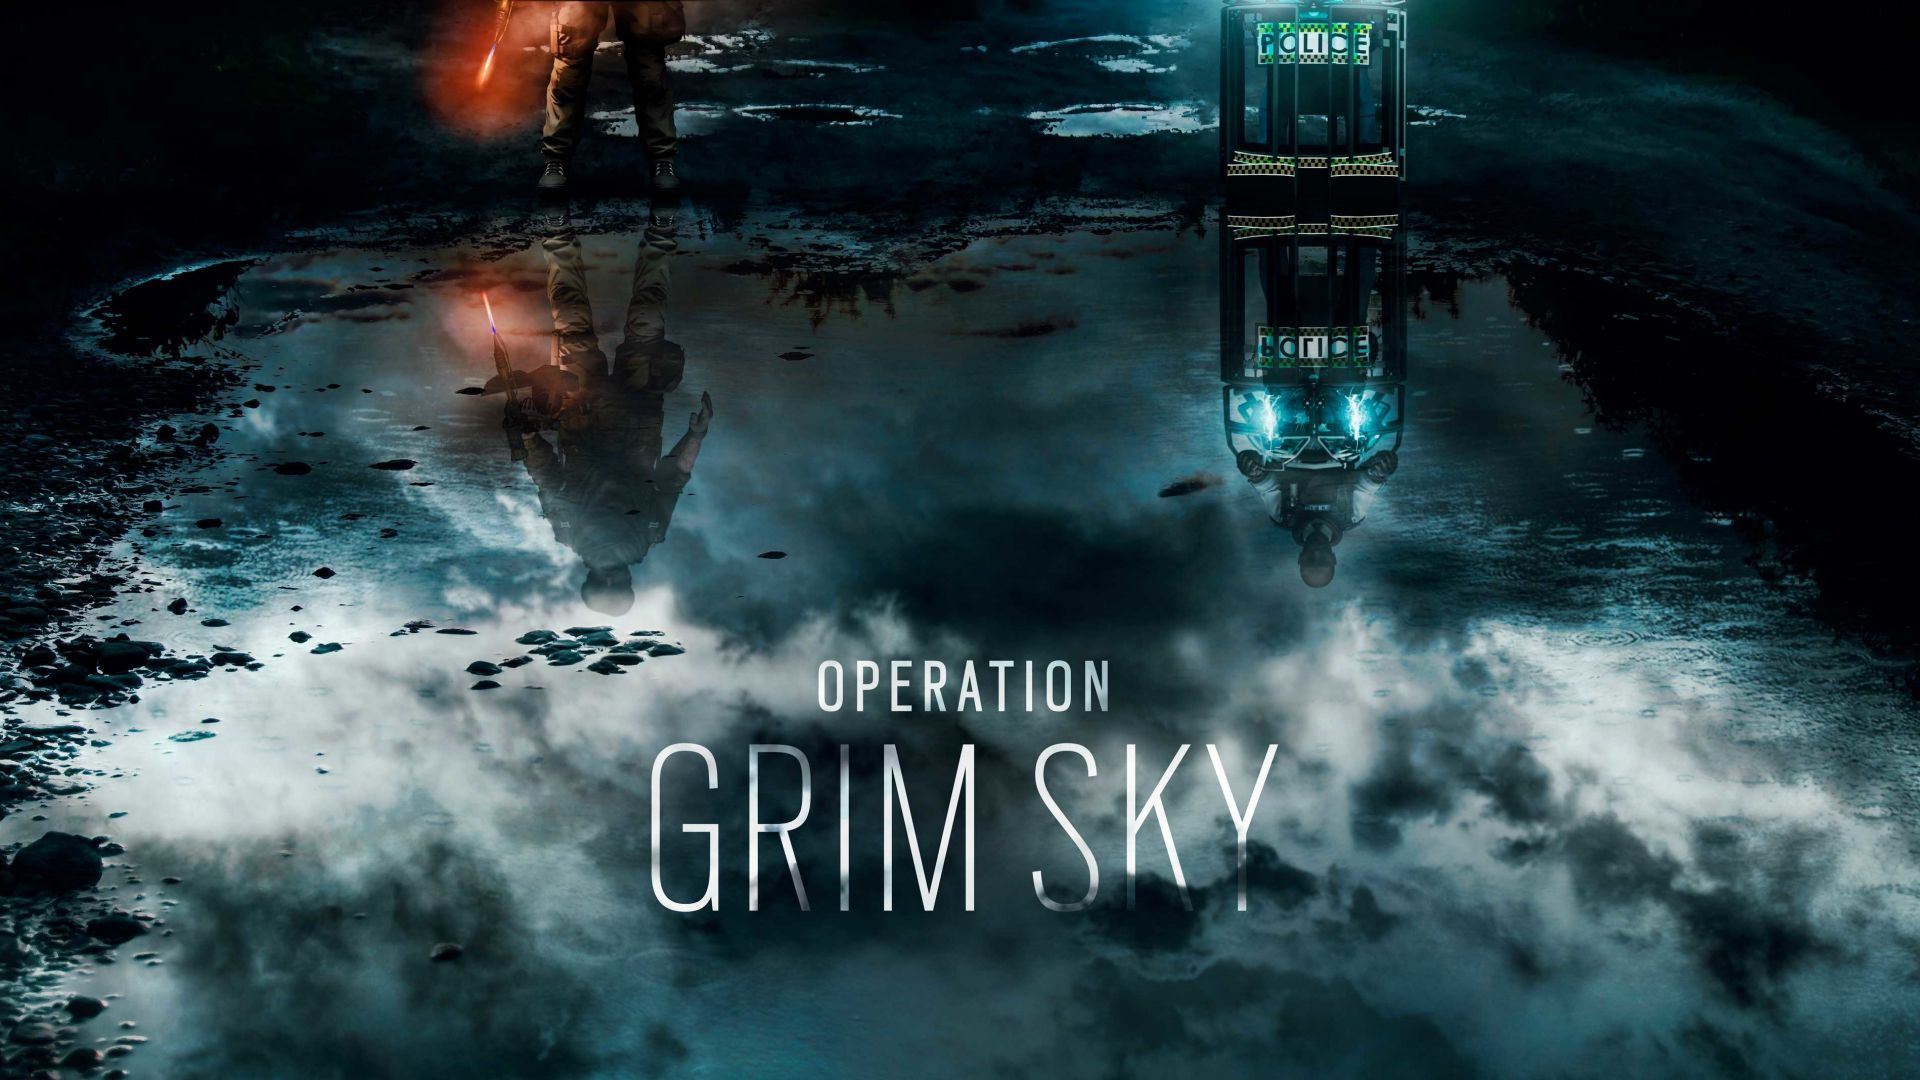 Operation Grim Sky Gamescom 2018 Tom Clancy S Rainbow Six Siege Poster Artwork 5k Horizontal Tom Clancy S Rainbow Six Tom Clancy Sky